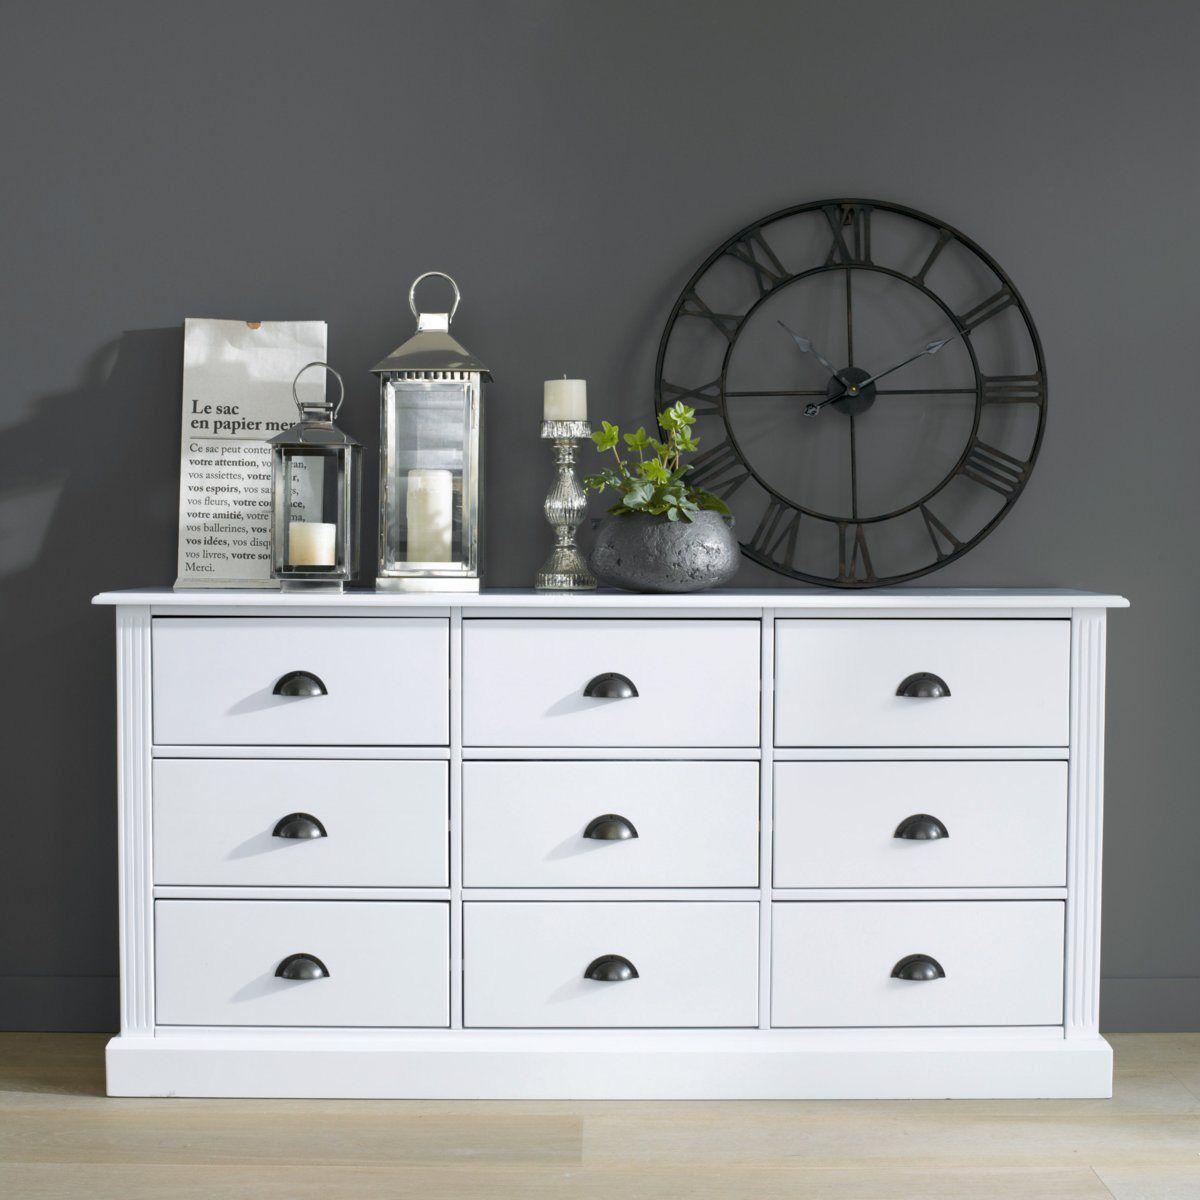 meuble de mercerie pin massif authentic style pin massif la redoute interieurs et la redoute. Black Bedroom Furniture Sets. Home Design Ideas